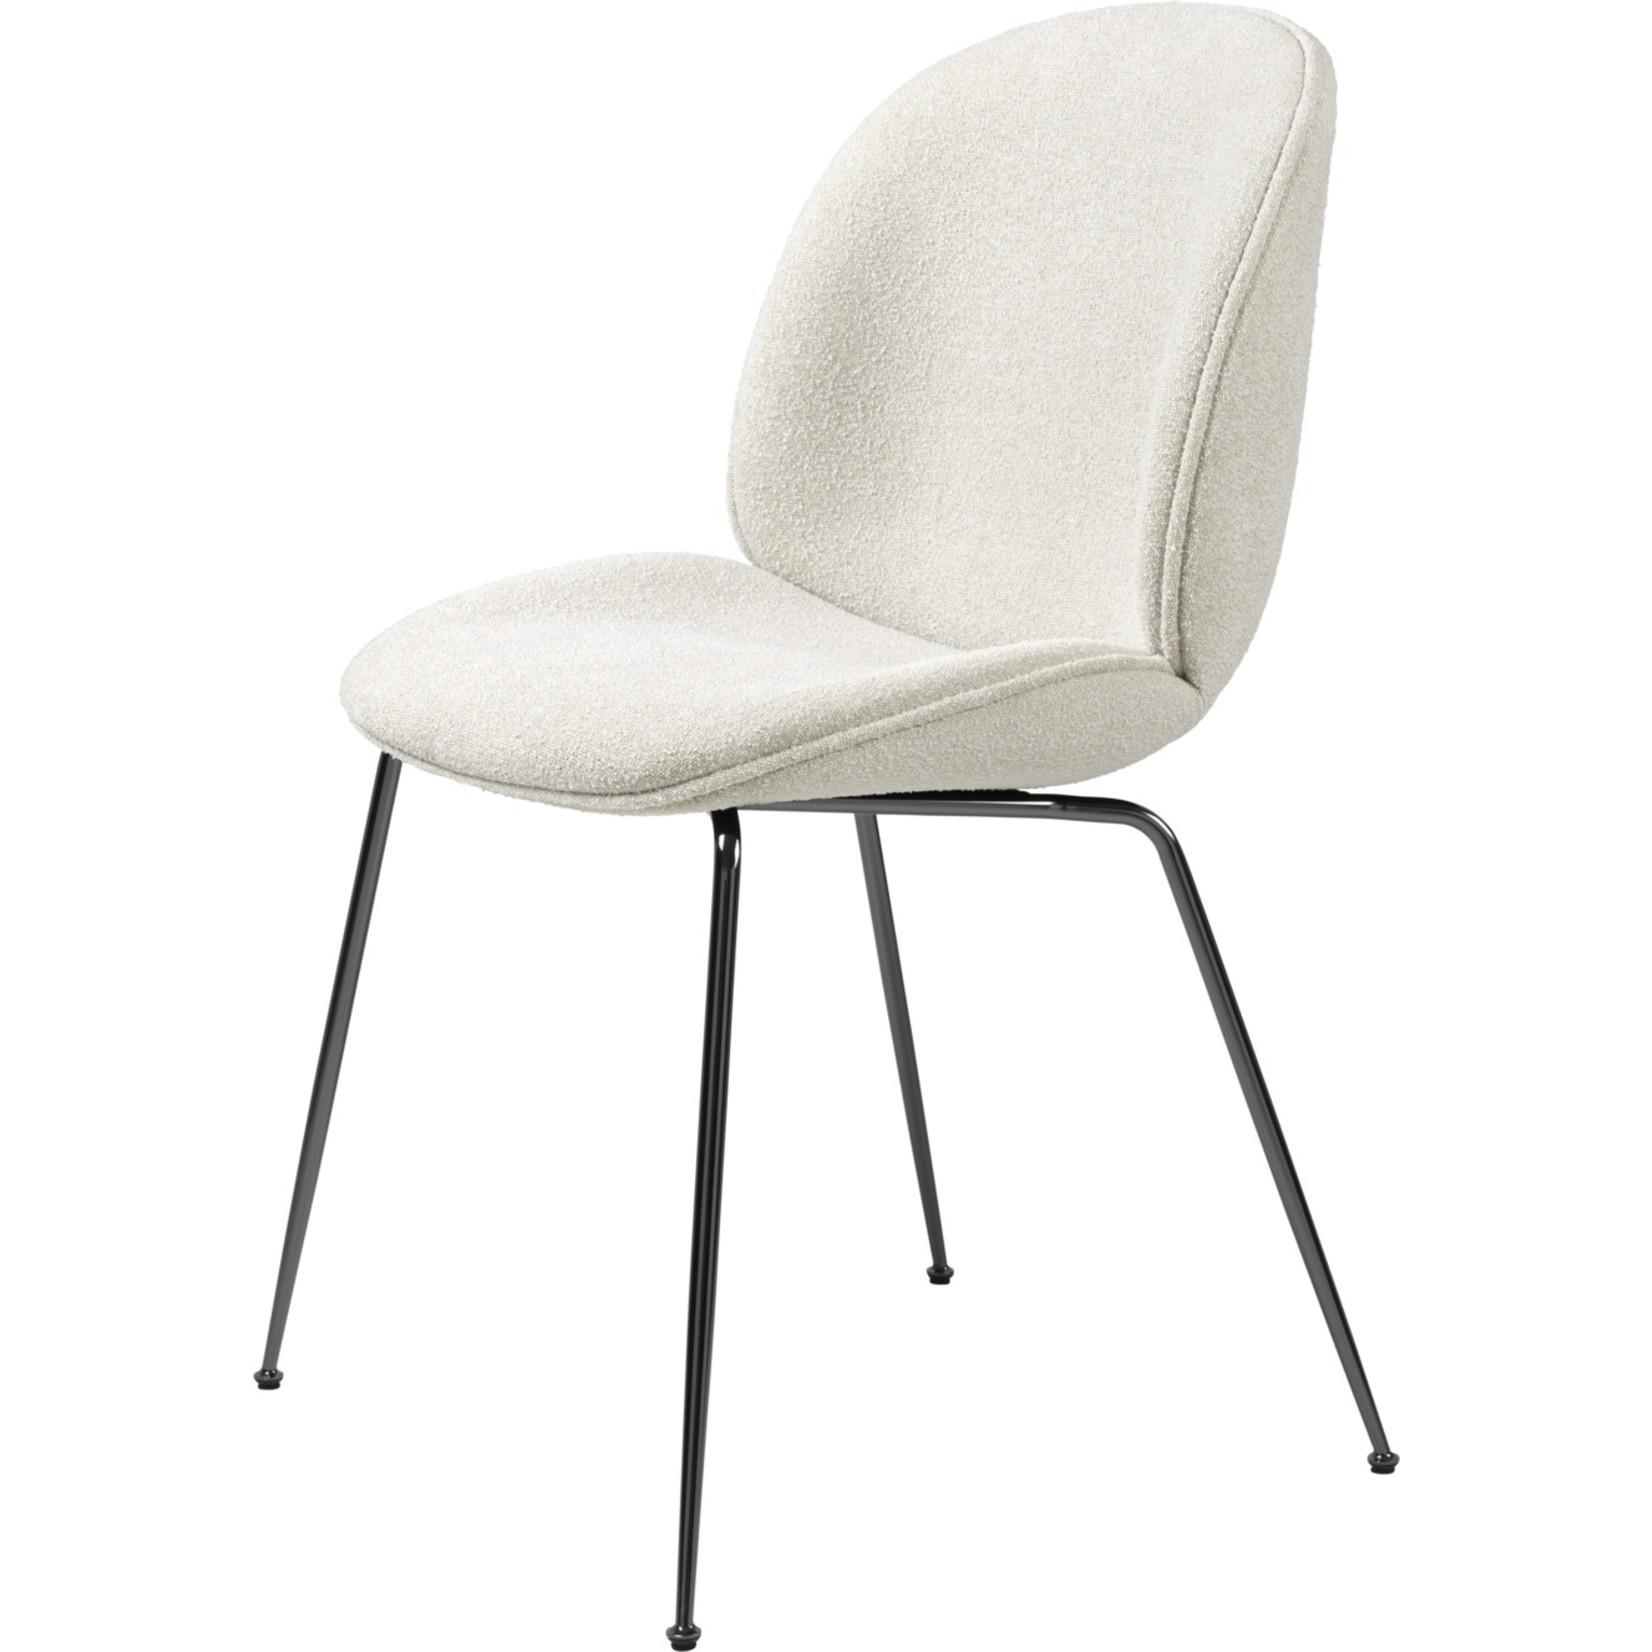 Gubi Beetle Dining Chair | Light Bouclé 001 & Black Chrome Base